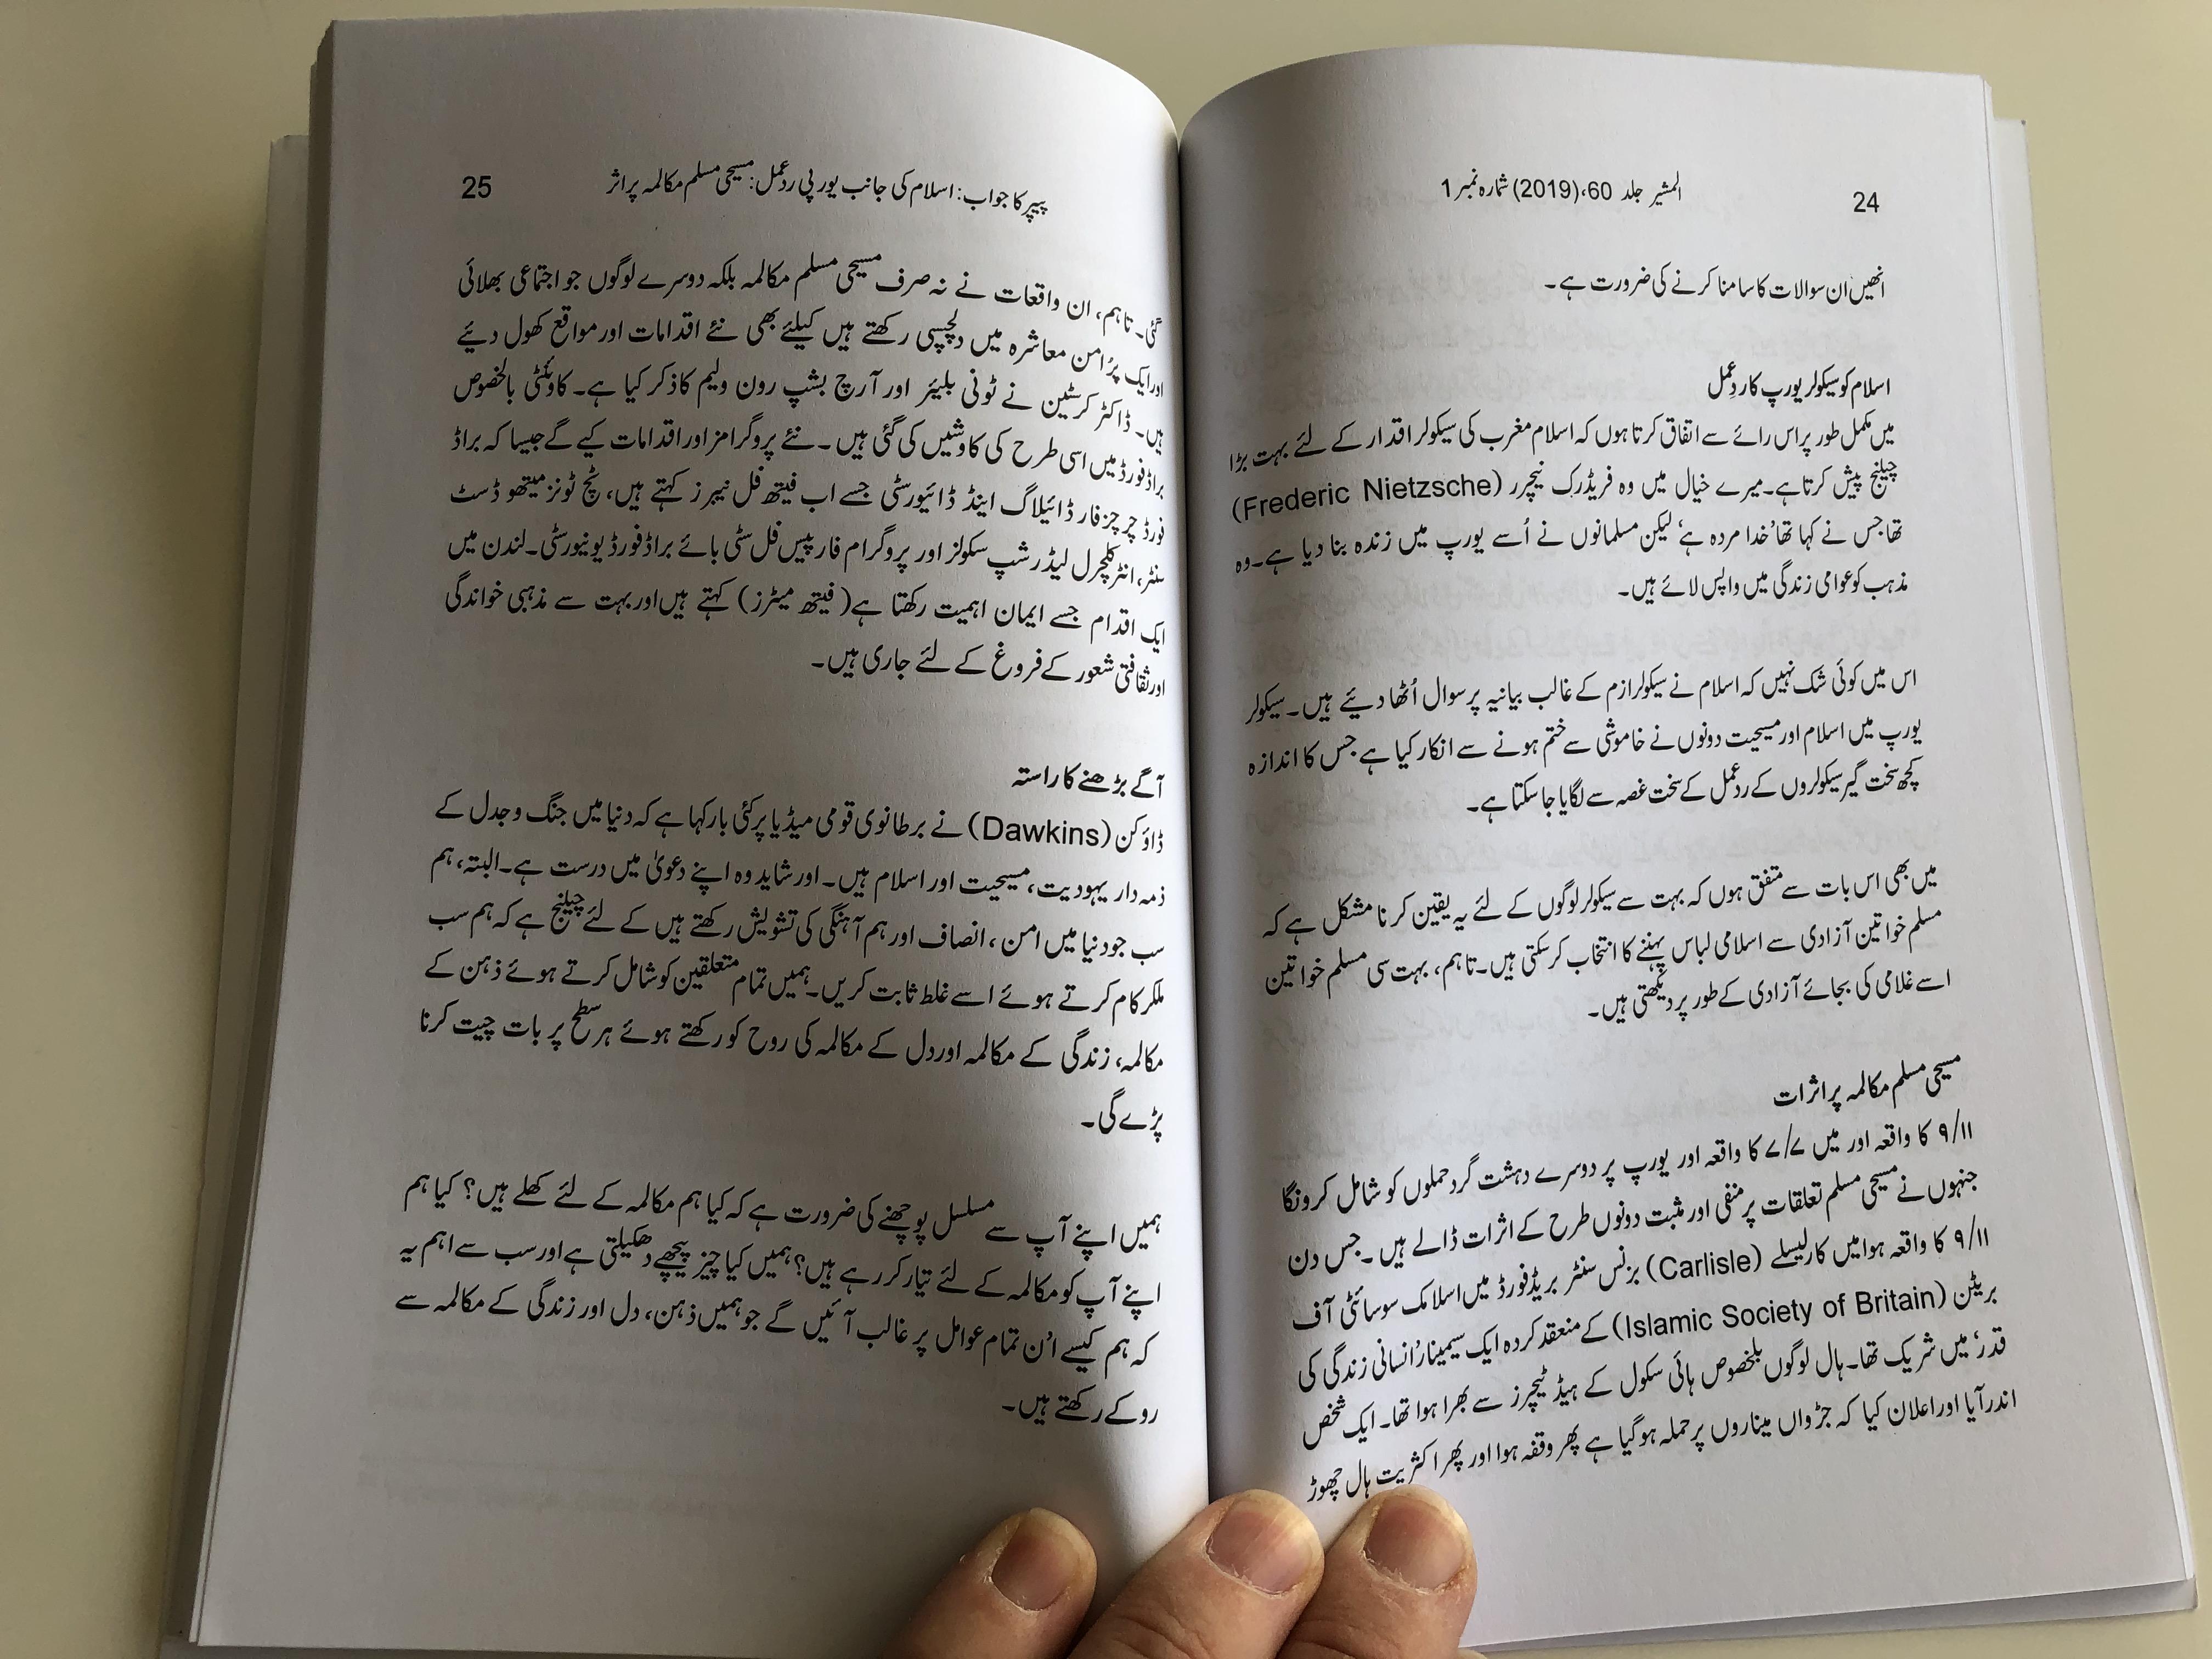 al-mushir-the-counselor-volume-60.-no.-1-8.jpg